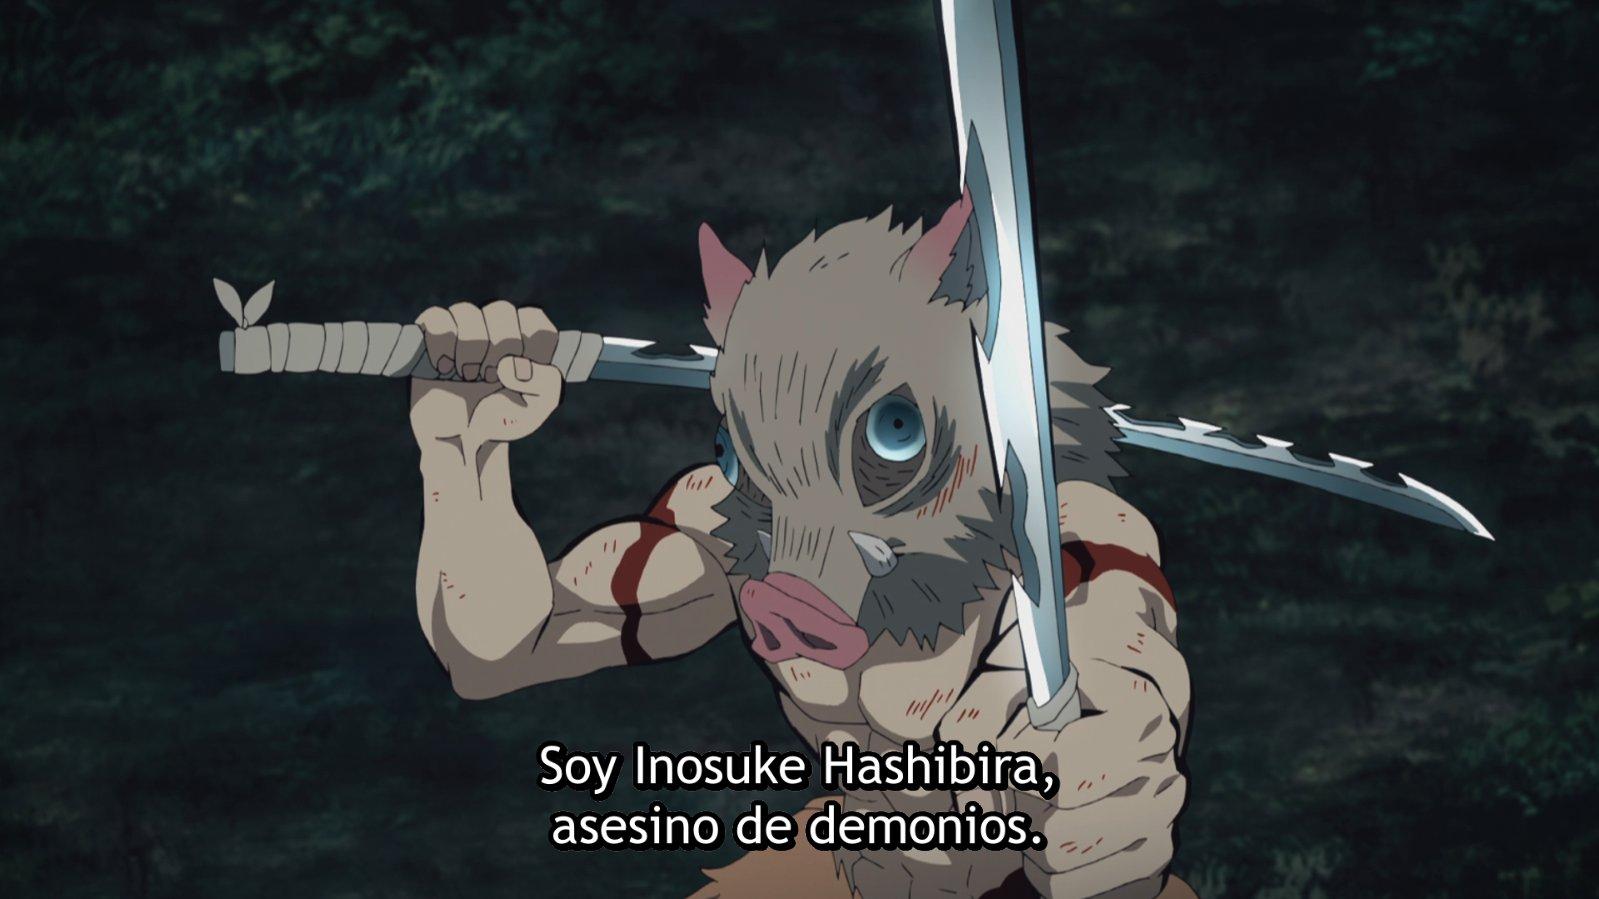 Inosuke